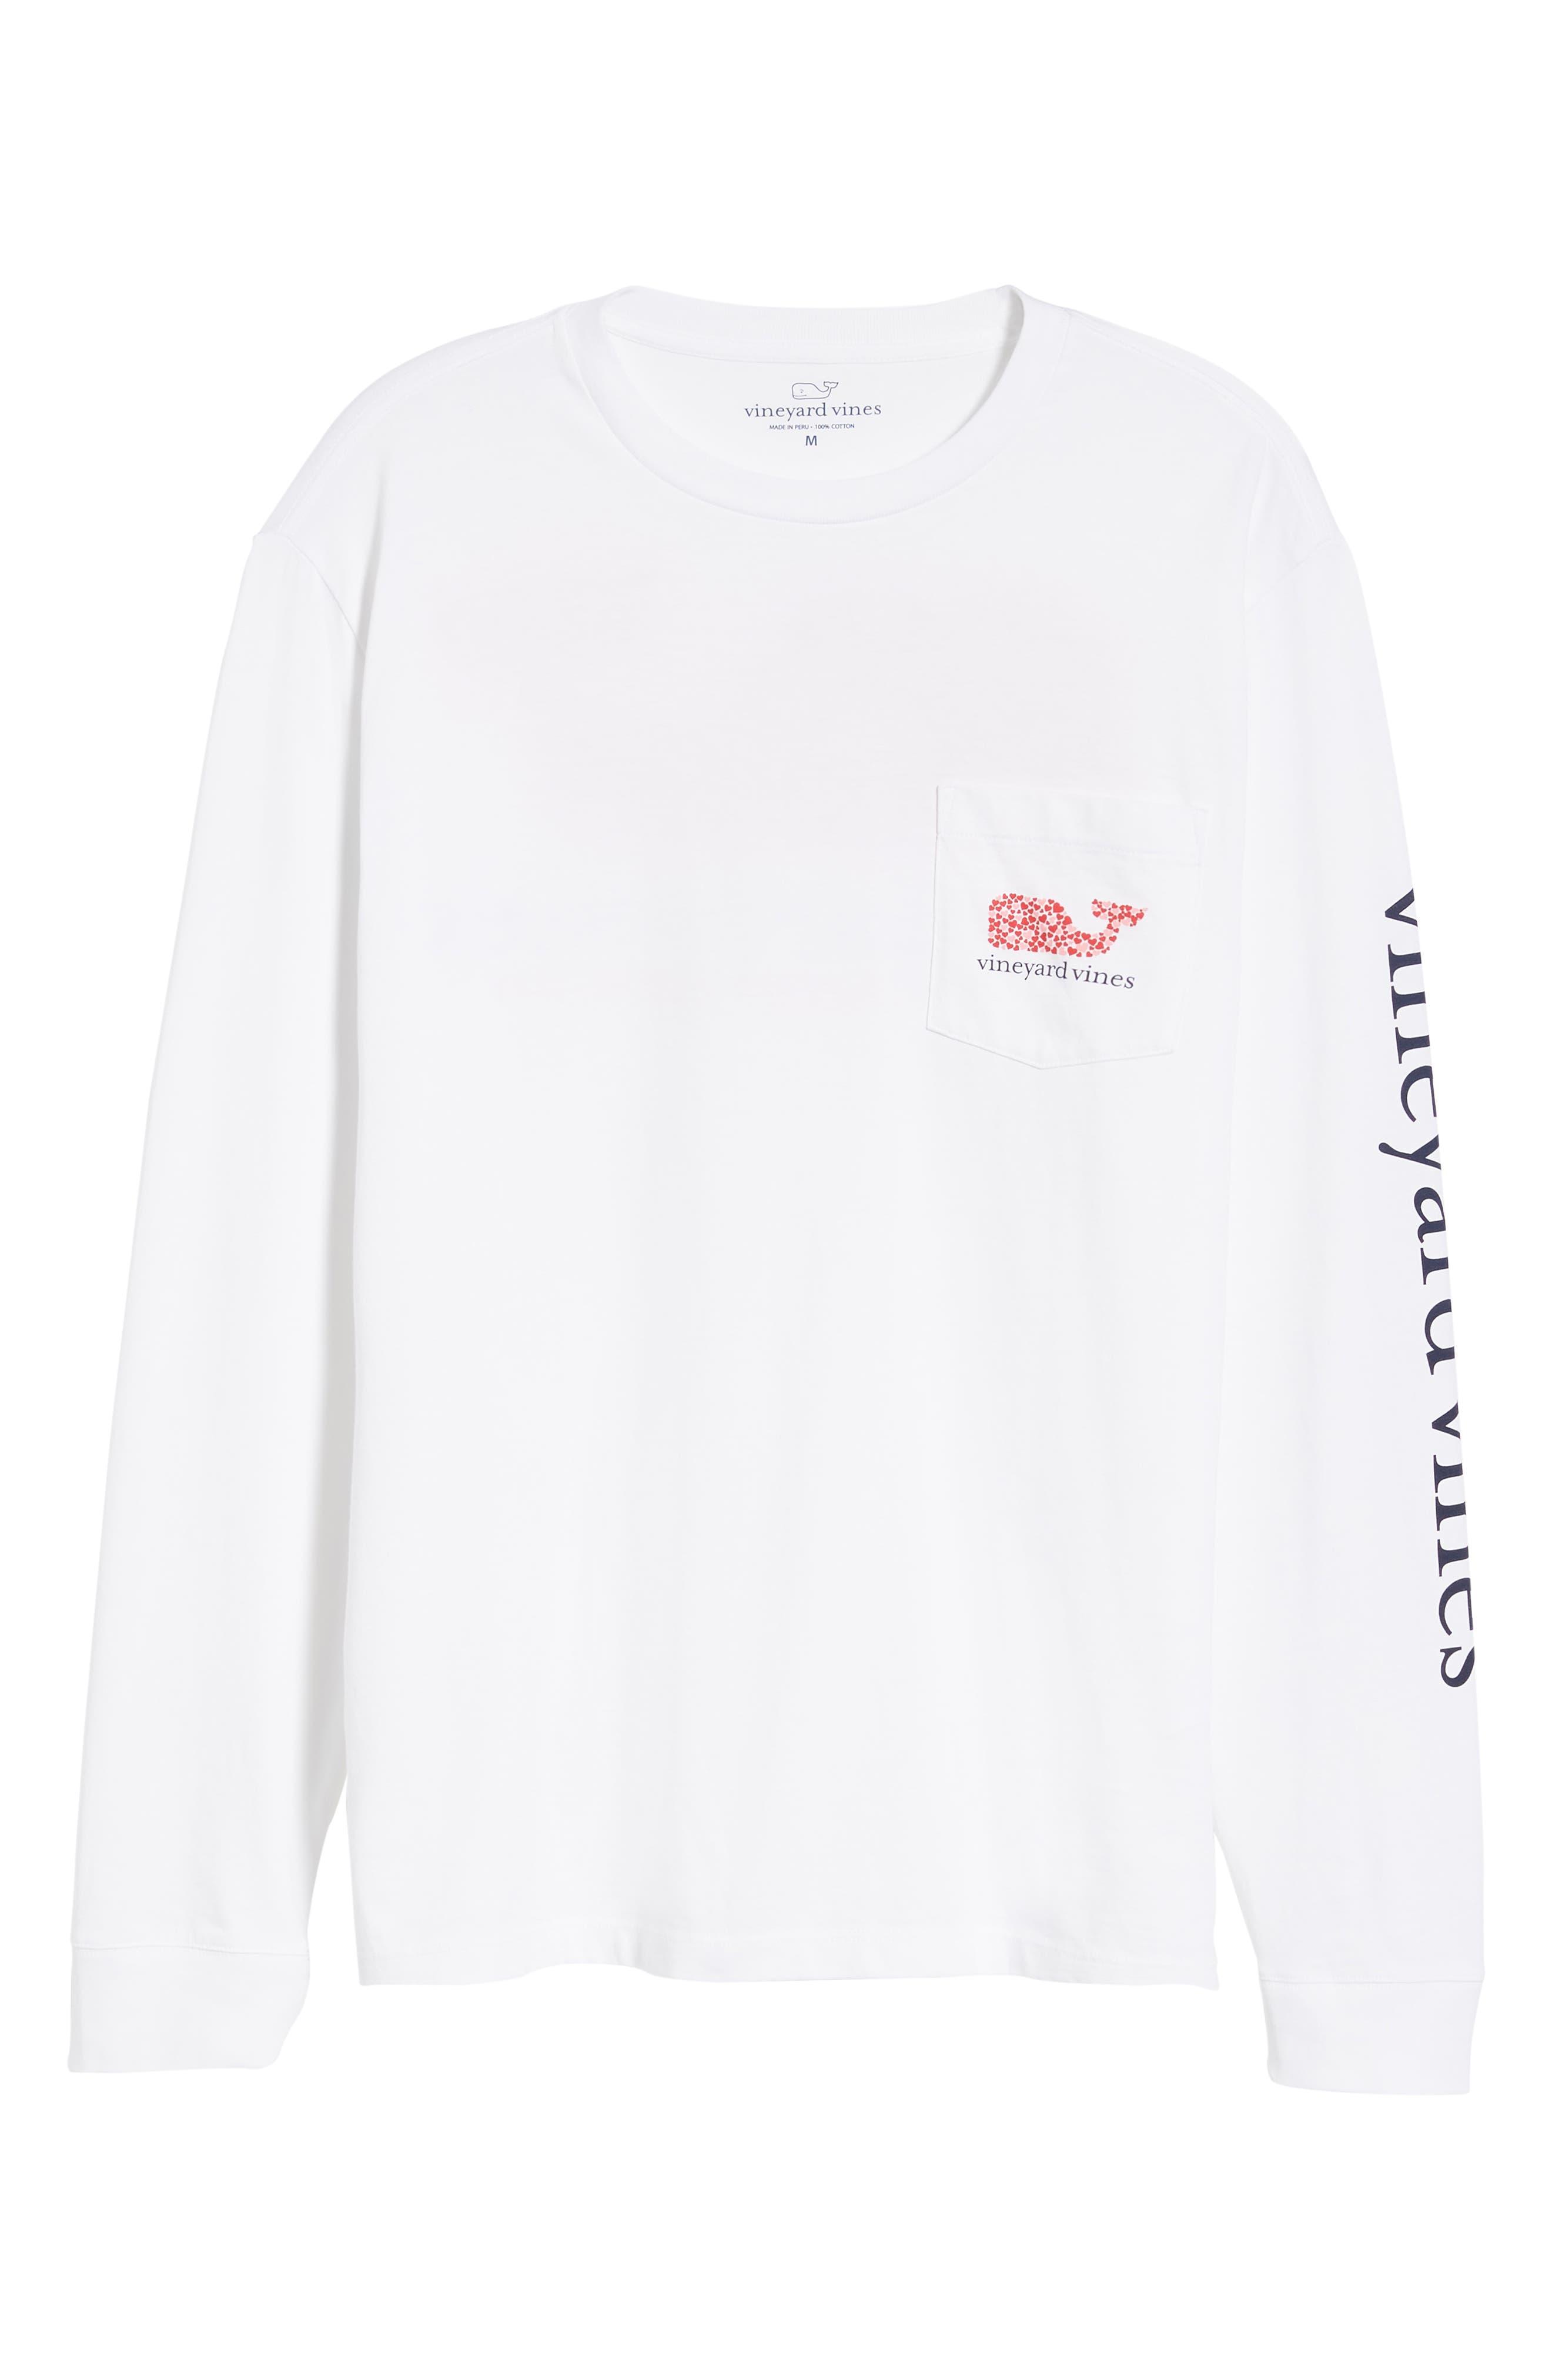 VINEYARD VINES,                             Valentine's Day Pocket T-Shirt,                             Alternate thumbnail 6, color,                             WHITE CAP